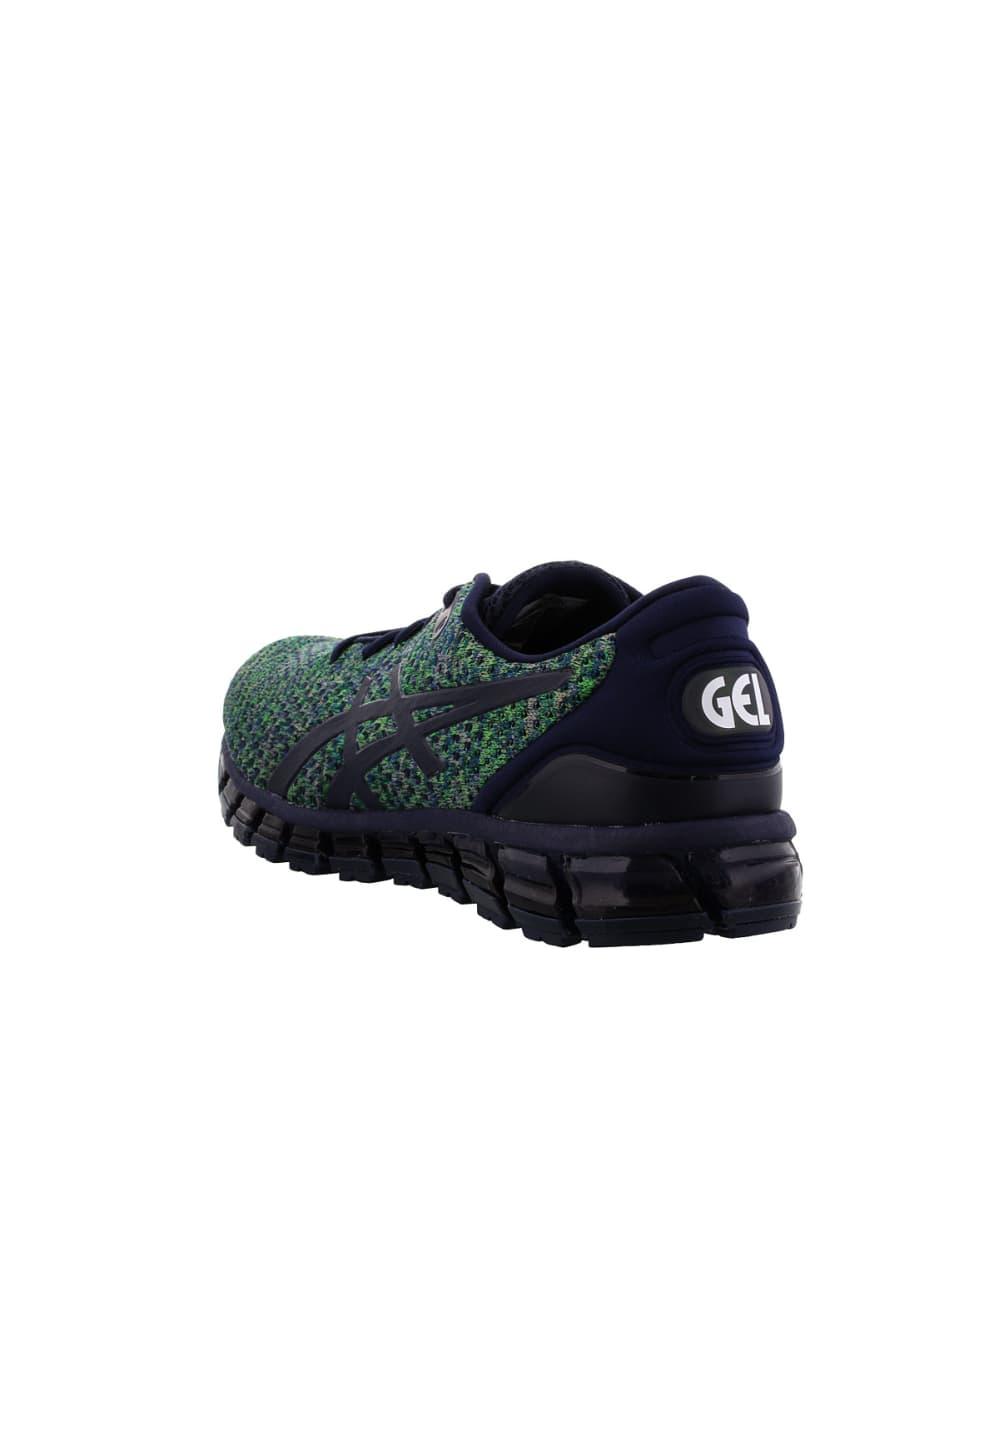 b31f92cf0c2f ASICS GEL-Quantum 360 Knit 2 - Running shoes for Men - Multicolor ...